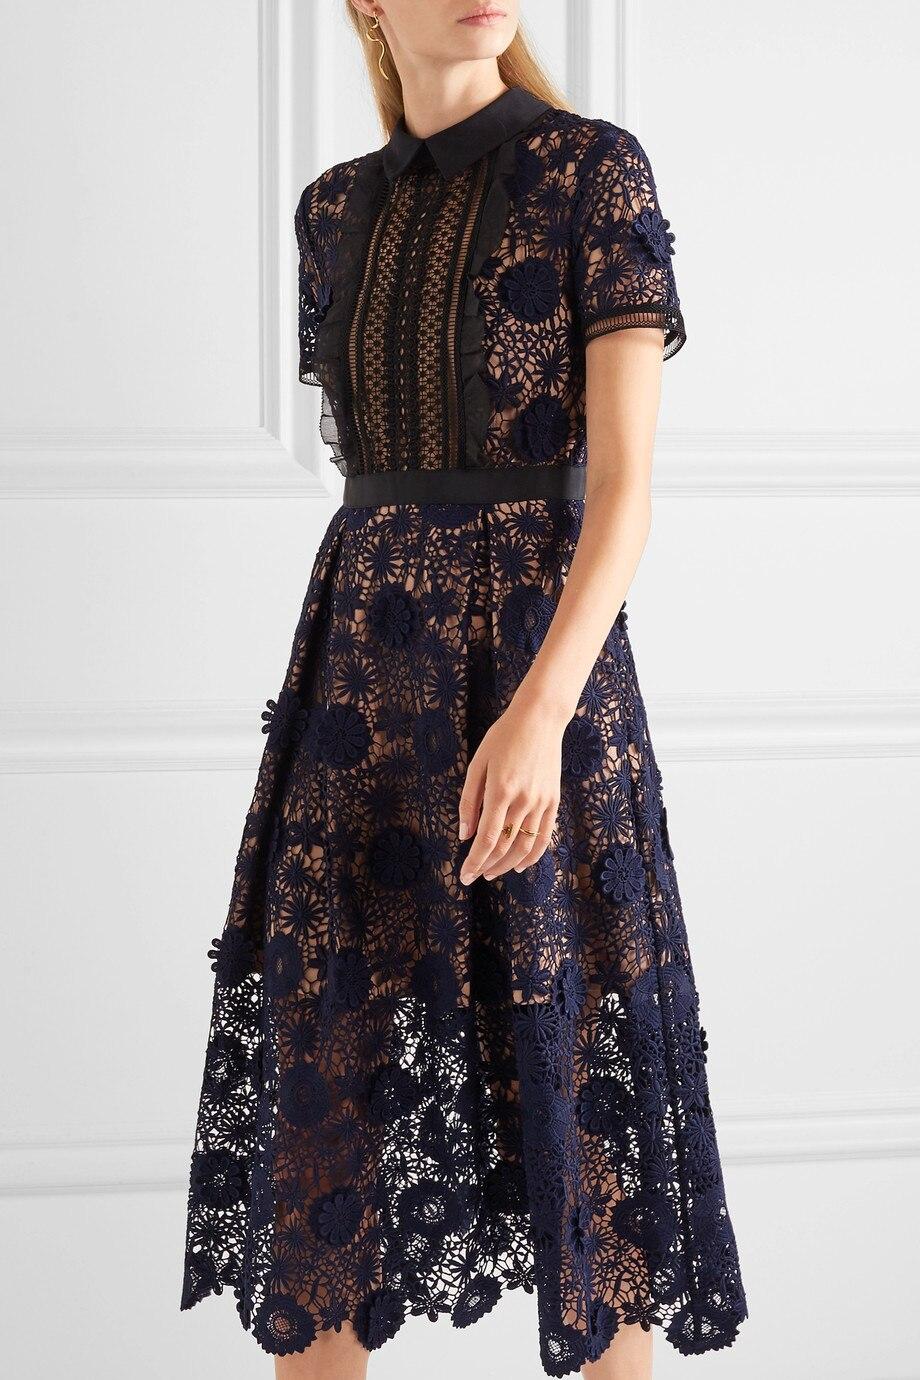 Galerry lace dress vero moda